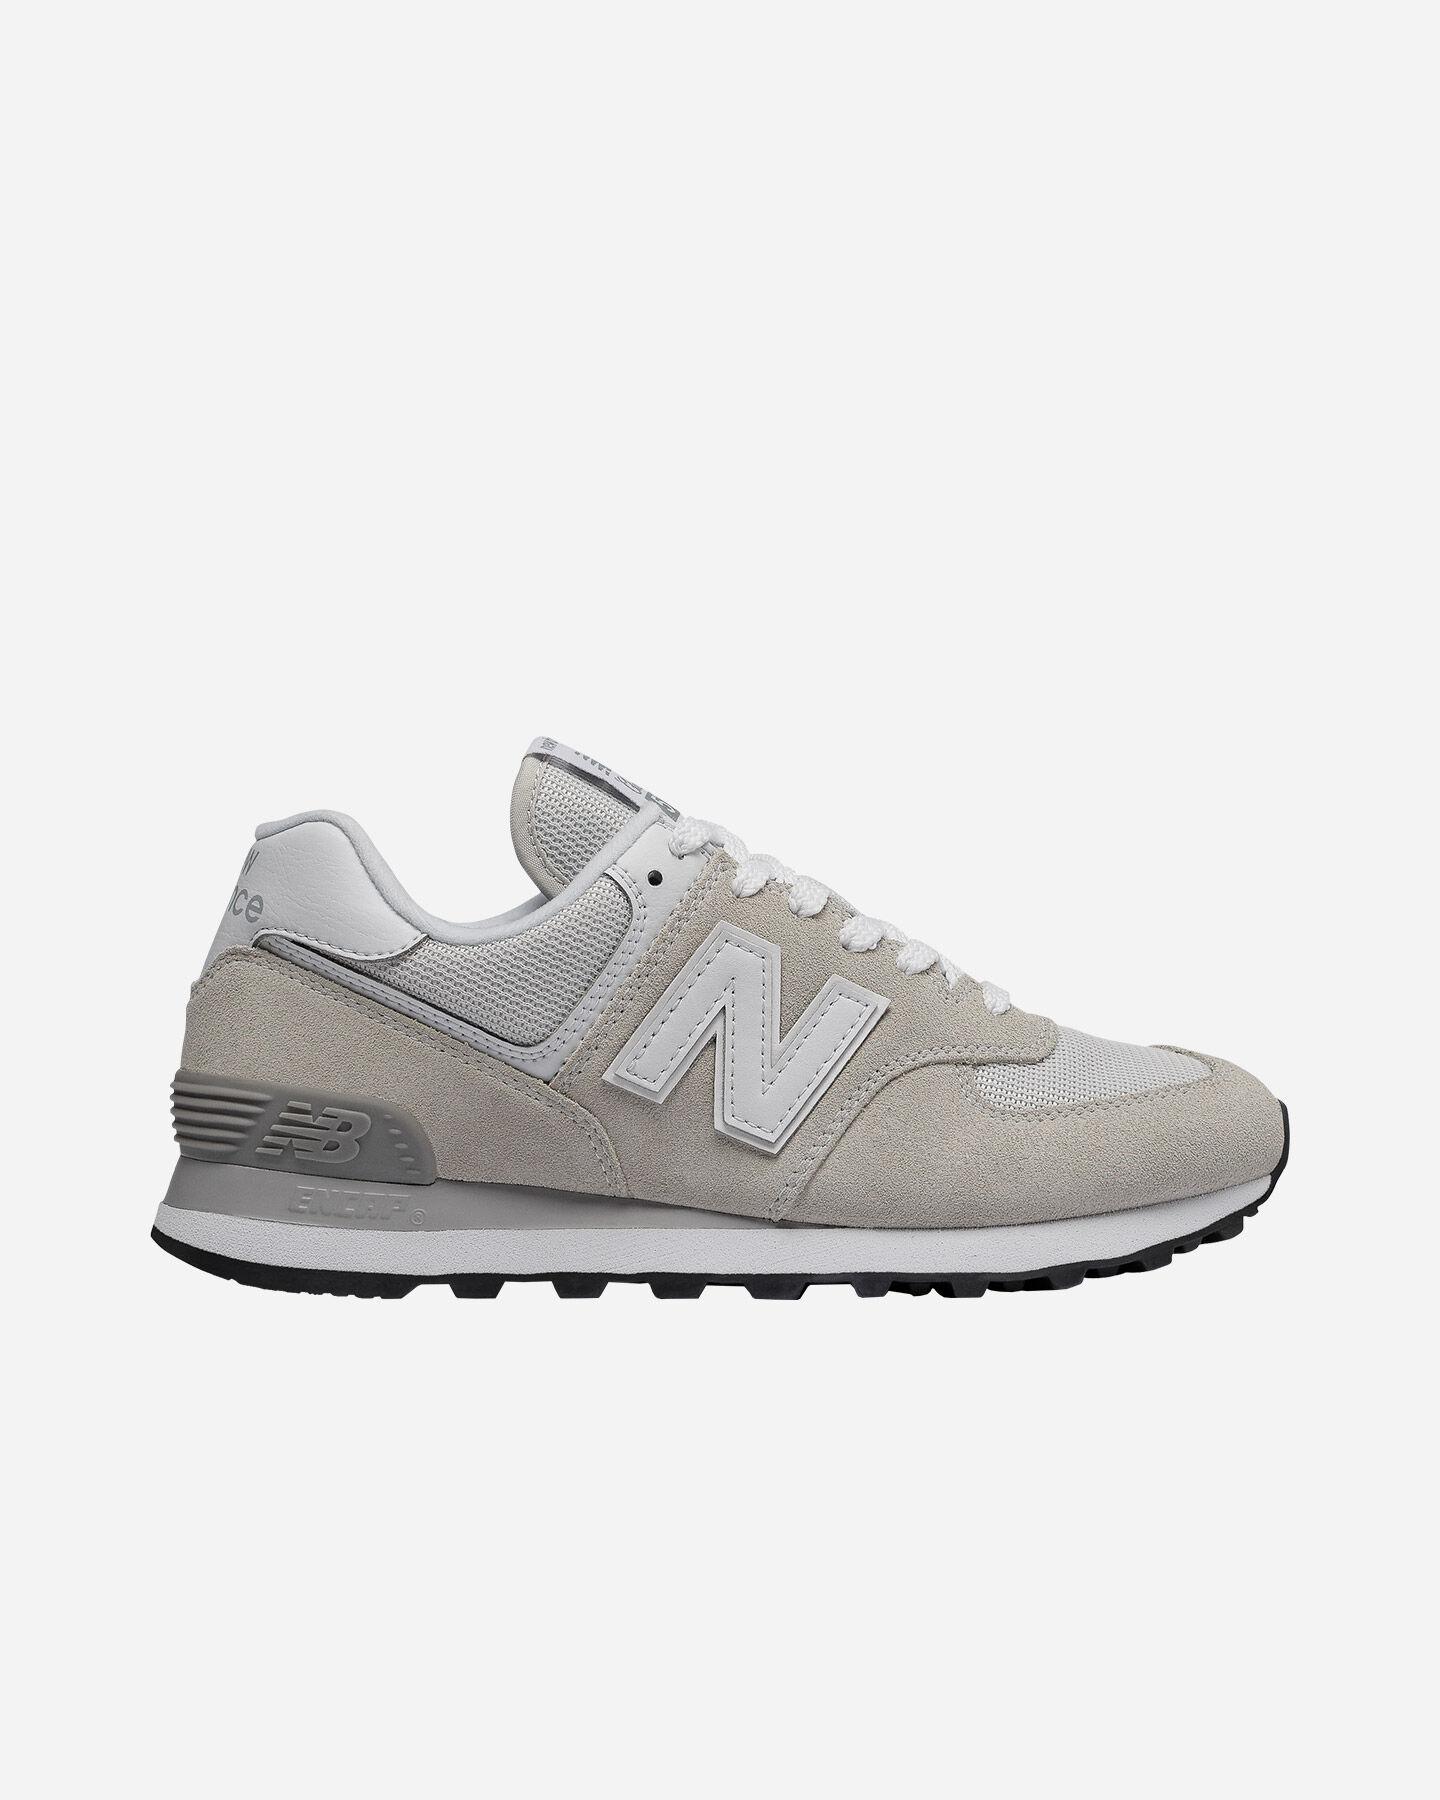 negozi scarpe nike loano